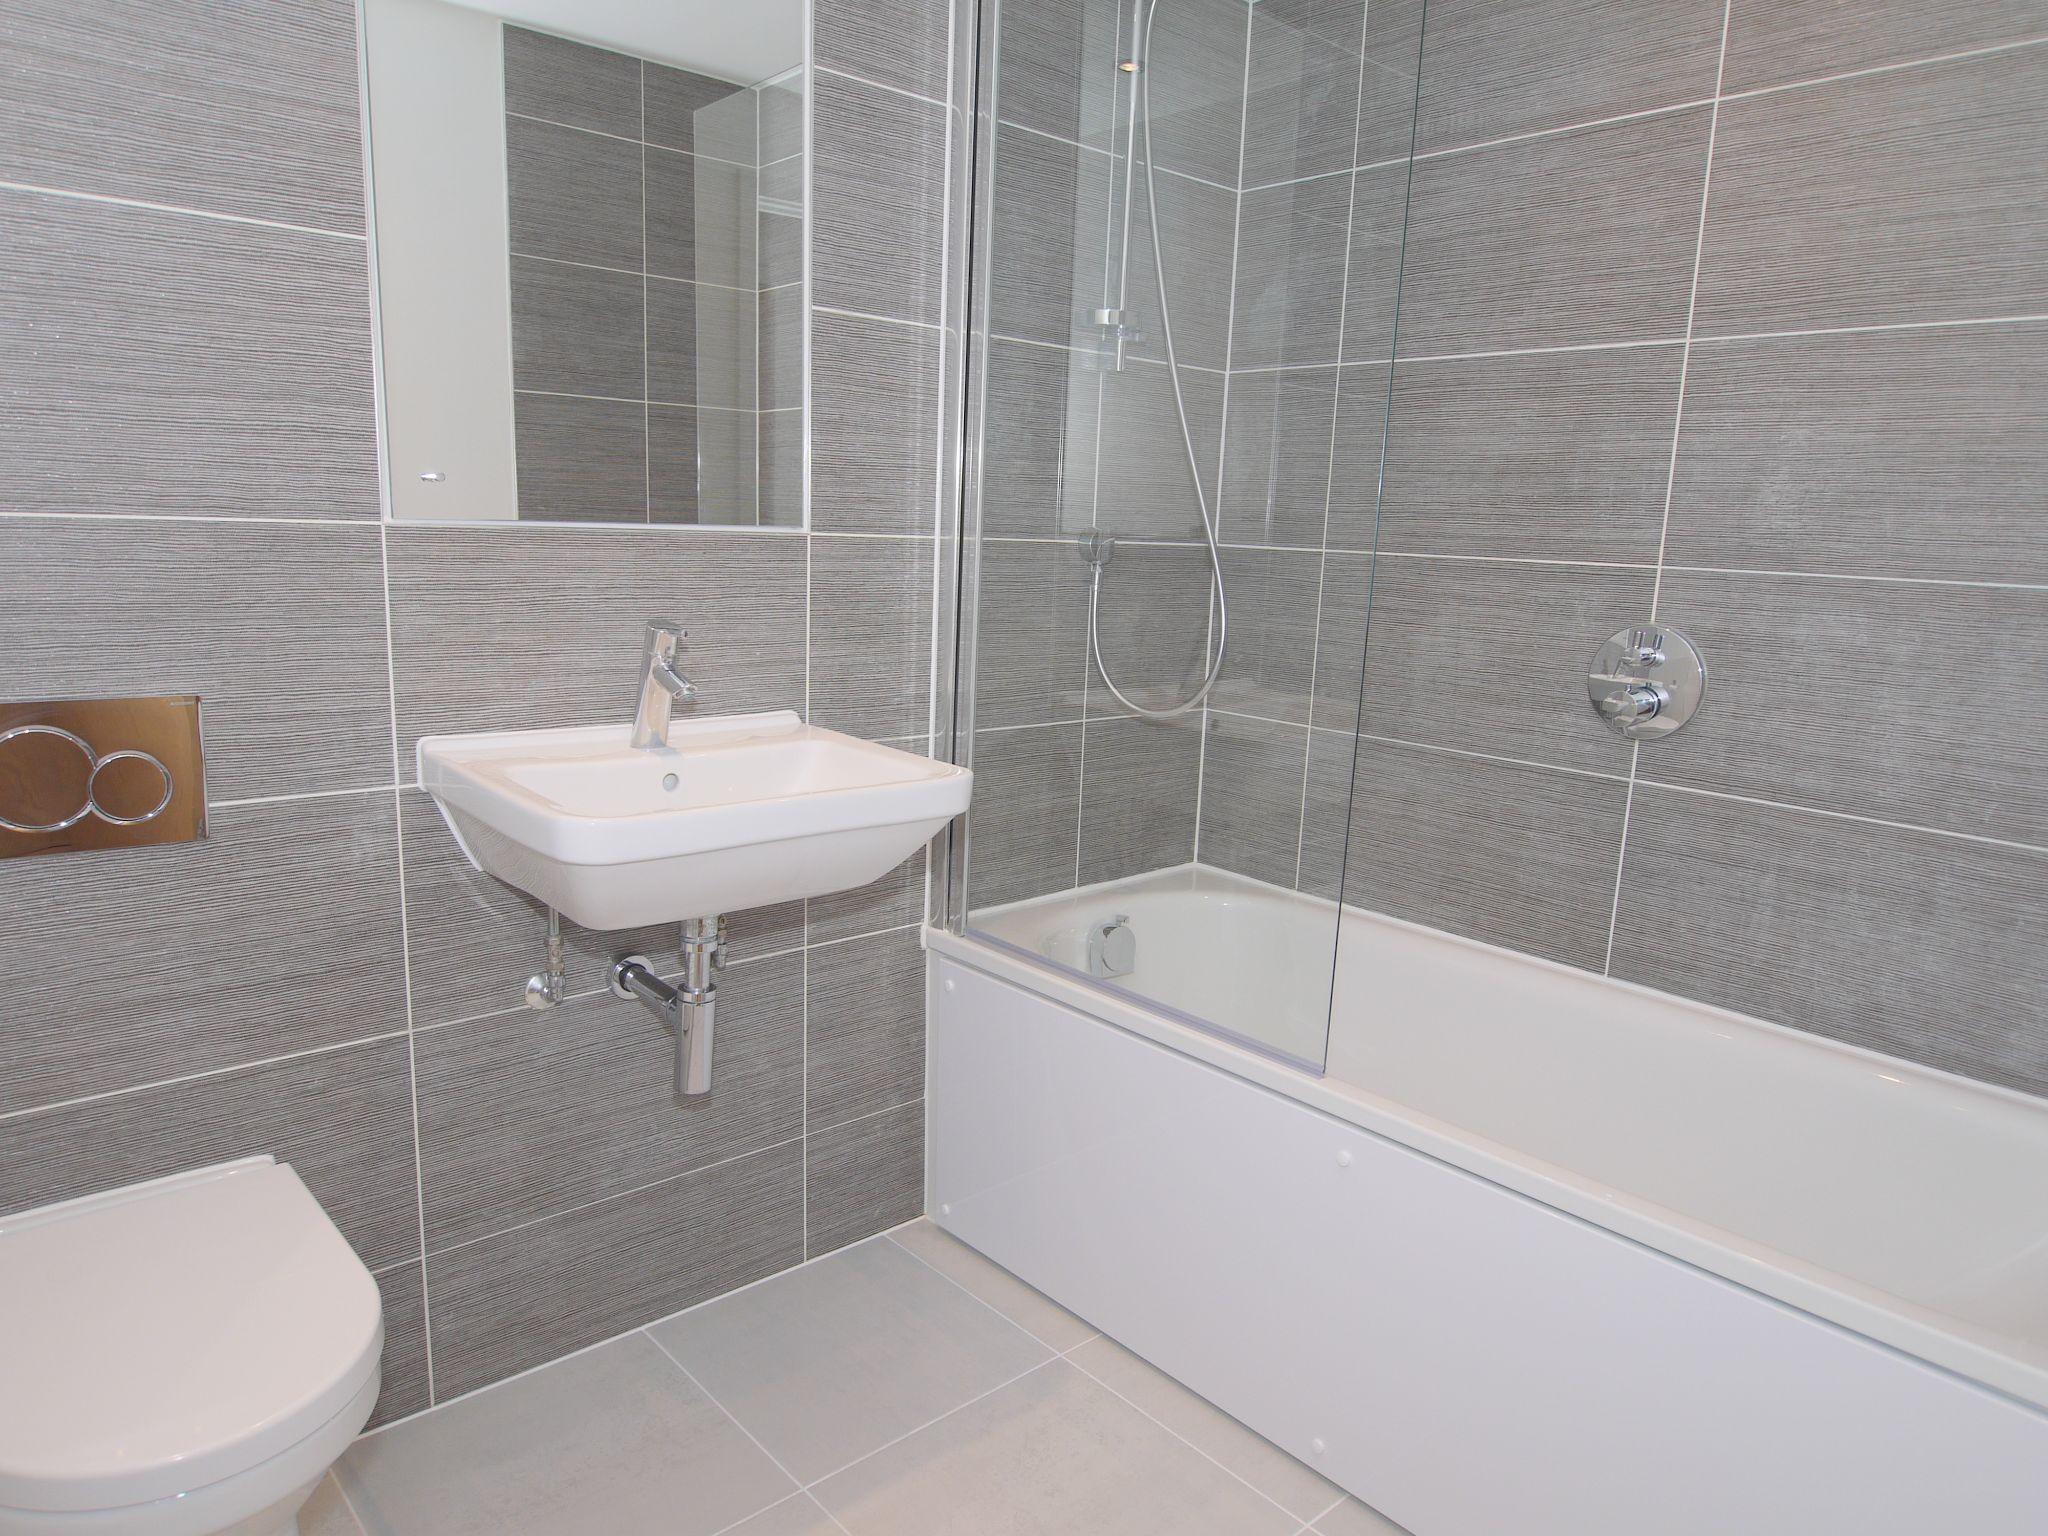 1 bedroom apartment For Sale in Sevenoaks - Photograph 7